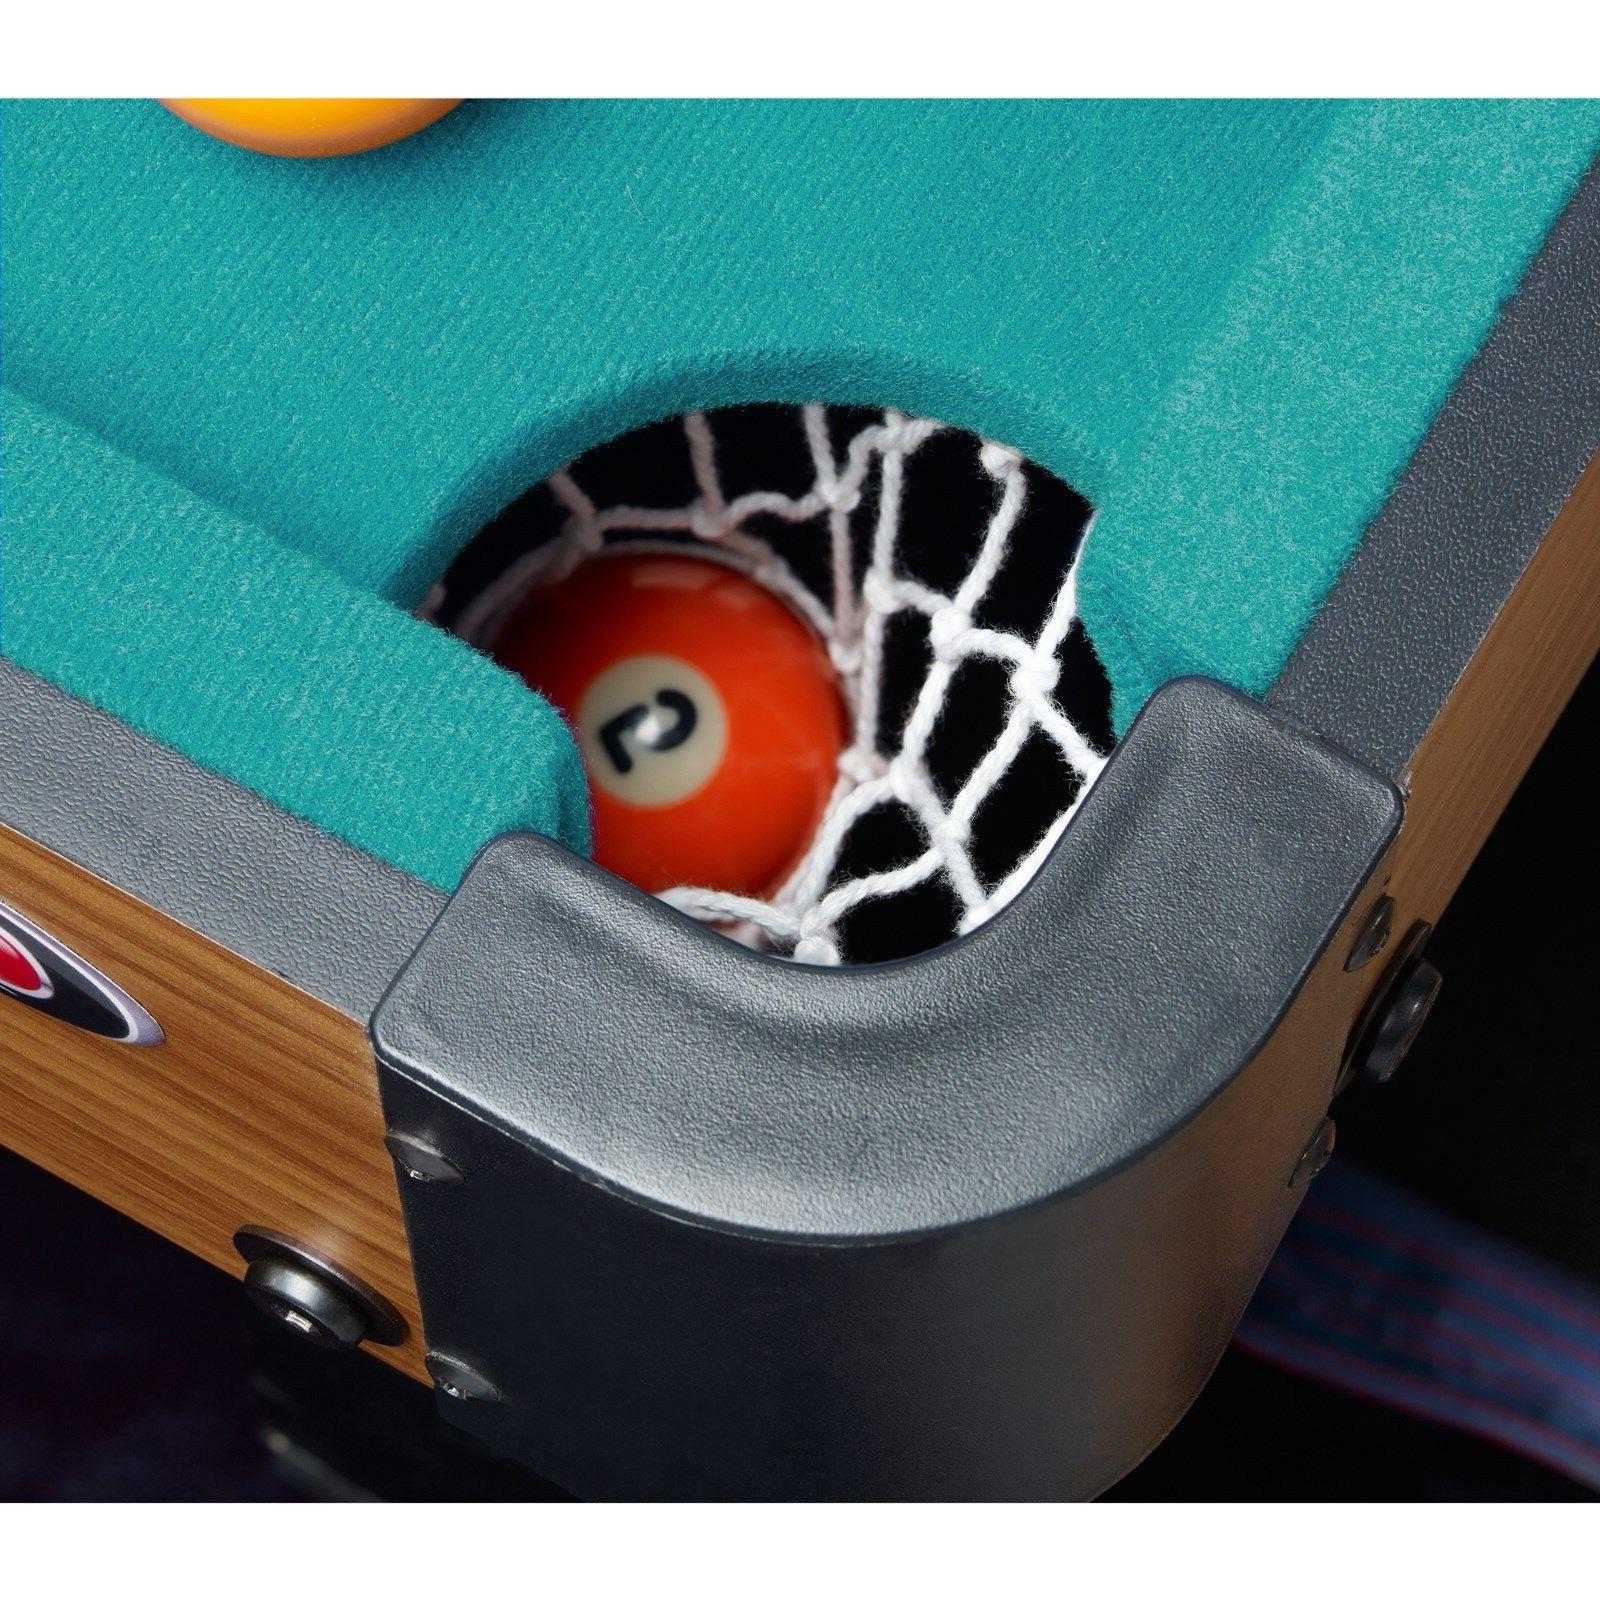 "Playcraft Sport Bank 40"" Pool Green Cloth"